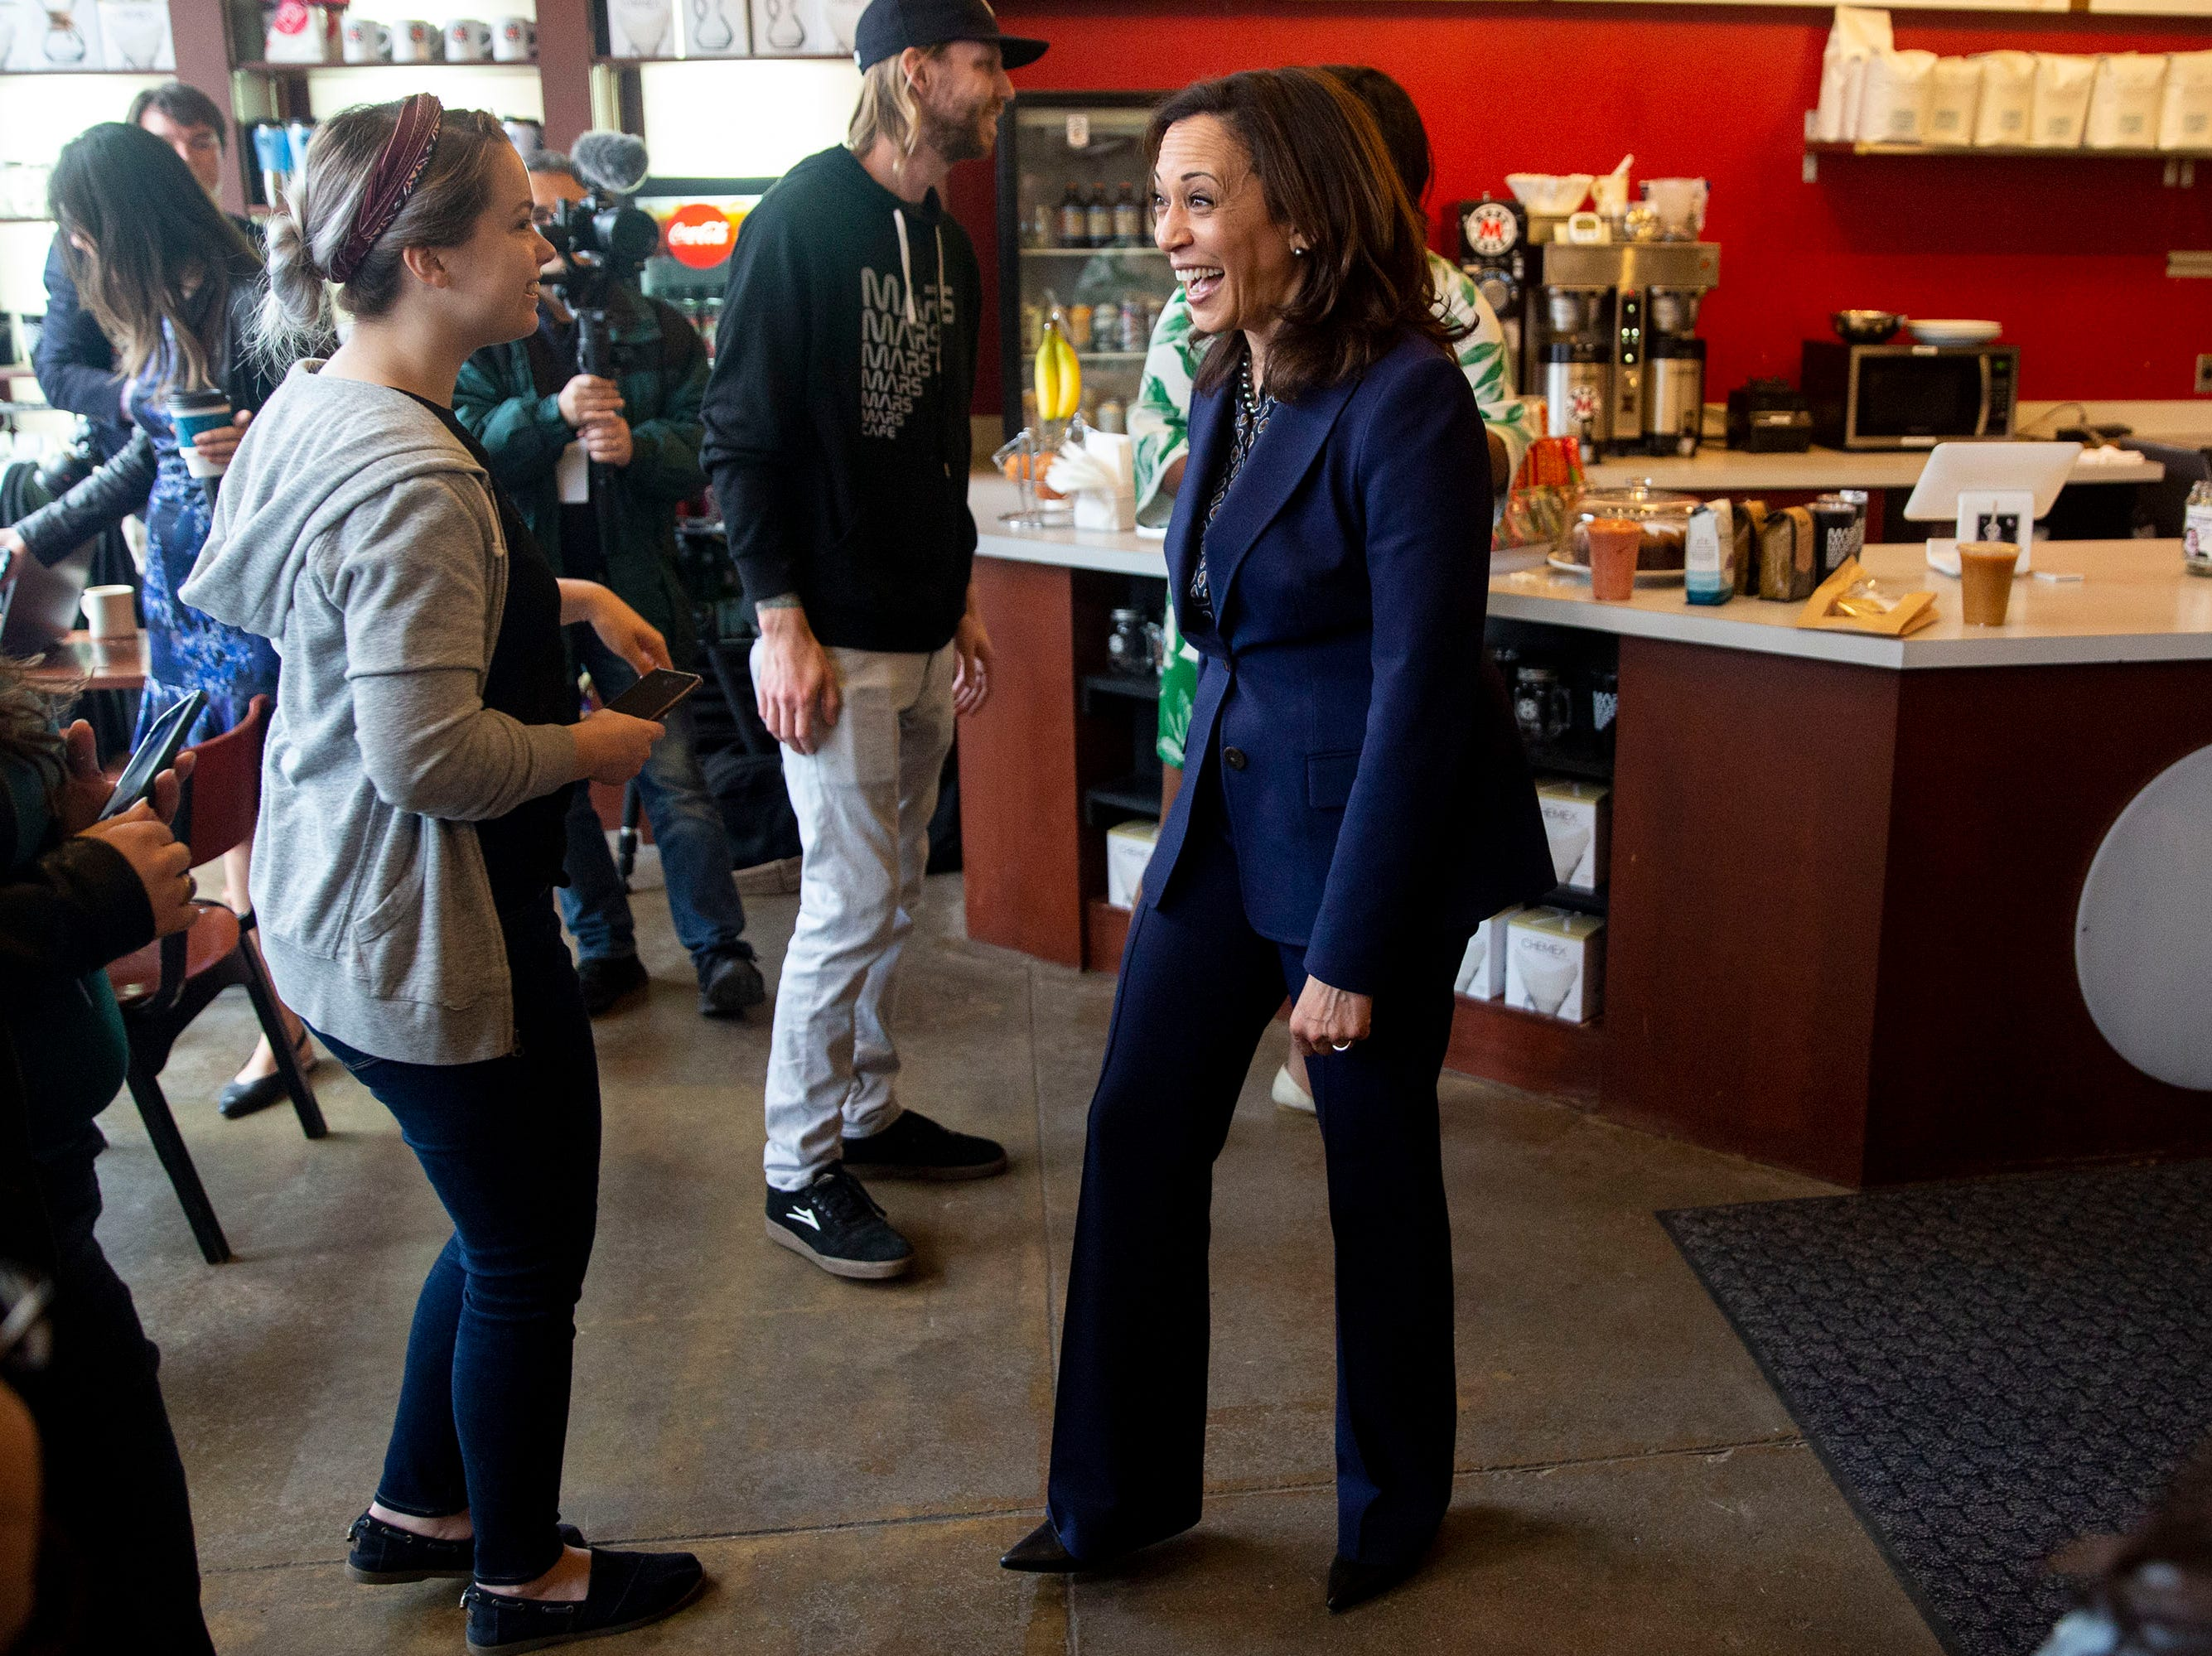 Sen. Kamala Harris, D-CA, visits Mars Cafe on Thursday, April 11, 2019, in Des Moines' Drake neighborhood.